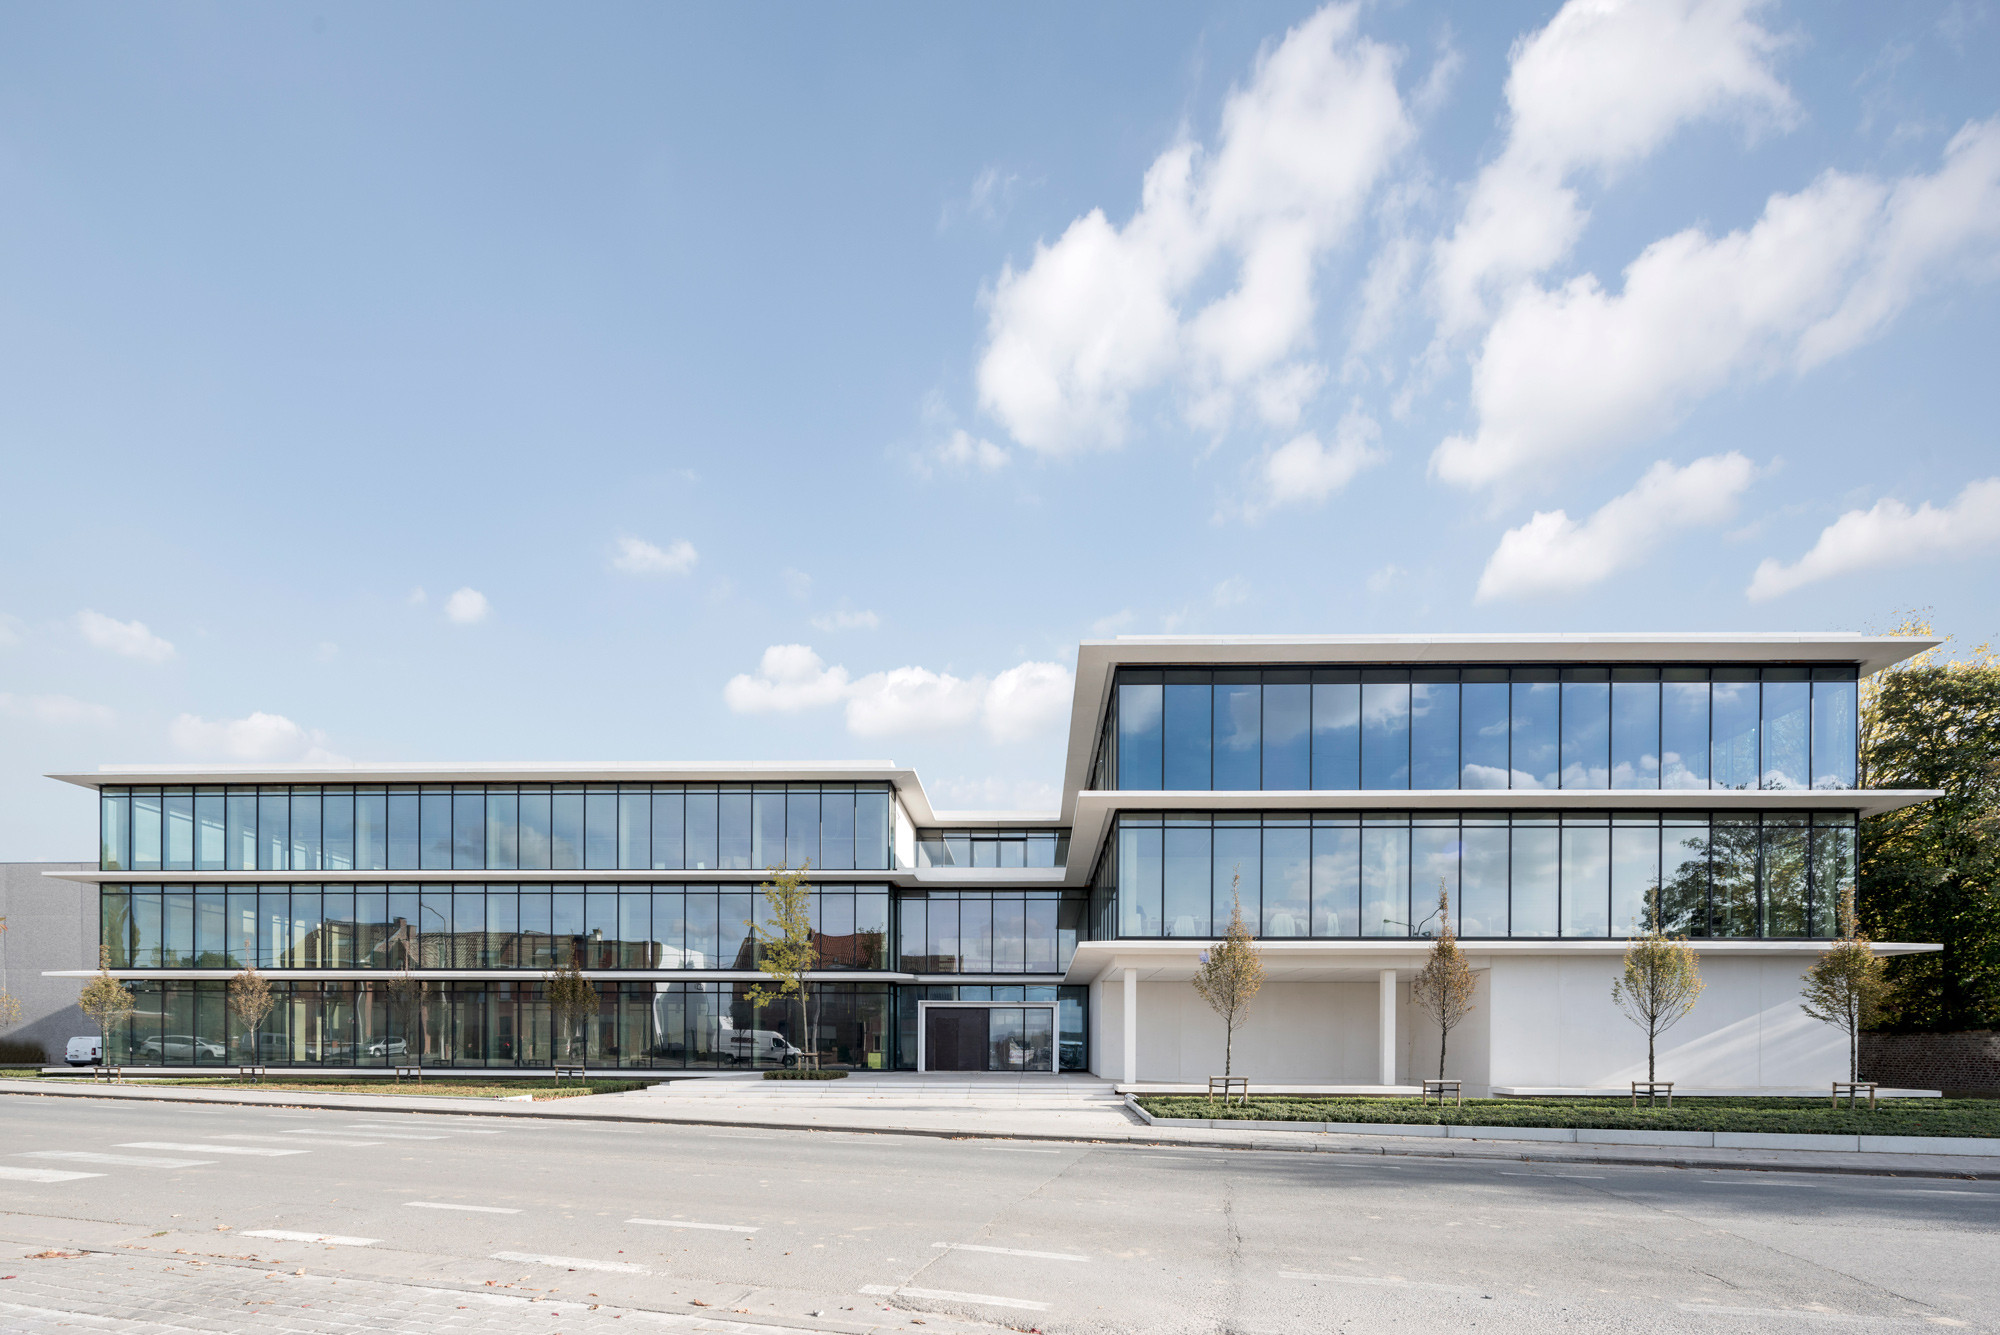 Kantoorgebouw3_Nieuwkerke_Claeys Architecten